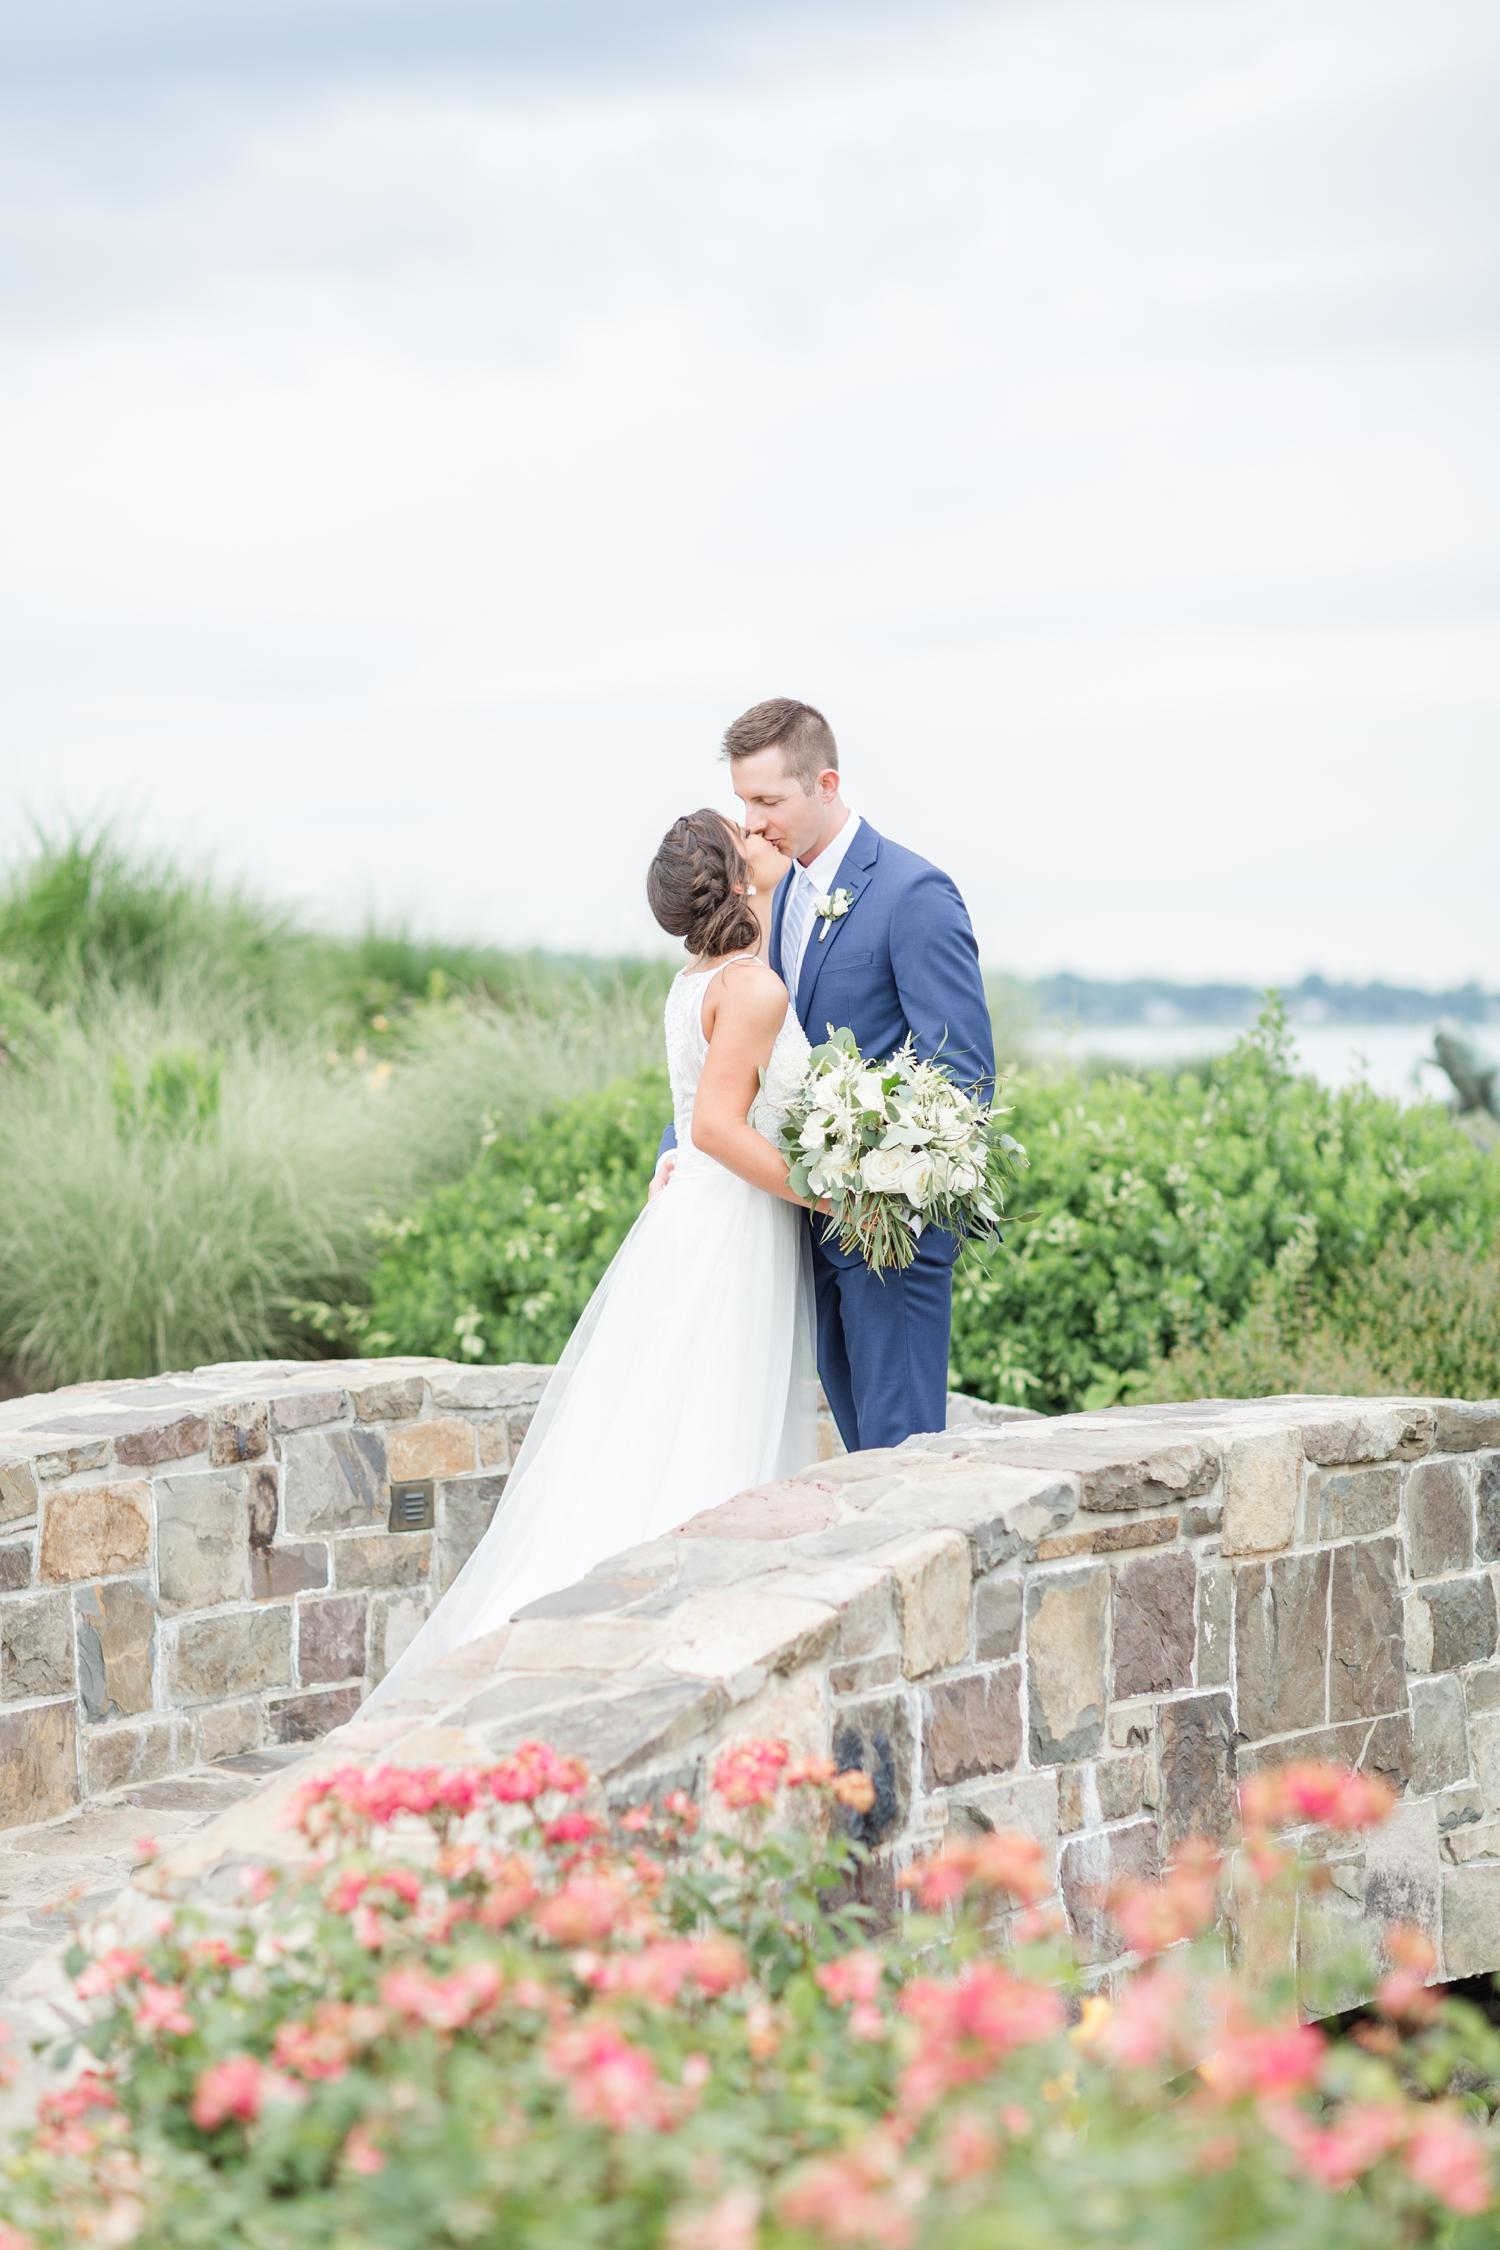 Schindler WEDDING HIGHLIGHTS-189_Herrington-on-the-Bay-wedding-Maryland-wedding-photographer-anna-grace-photography-photo.jpg